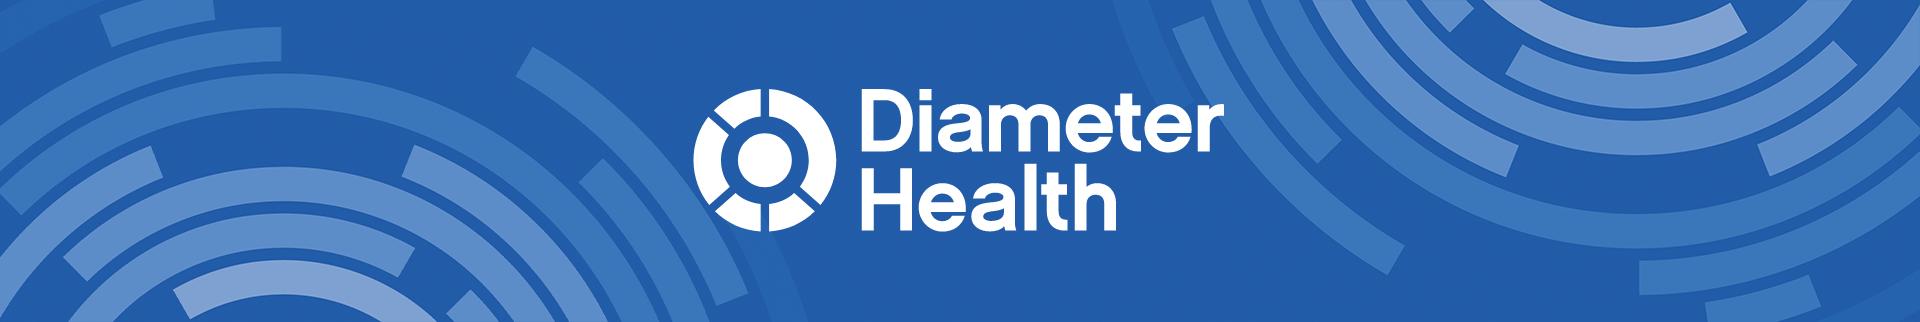 Diametr Health copy (2)